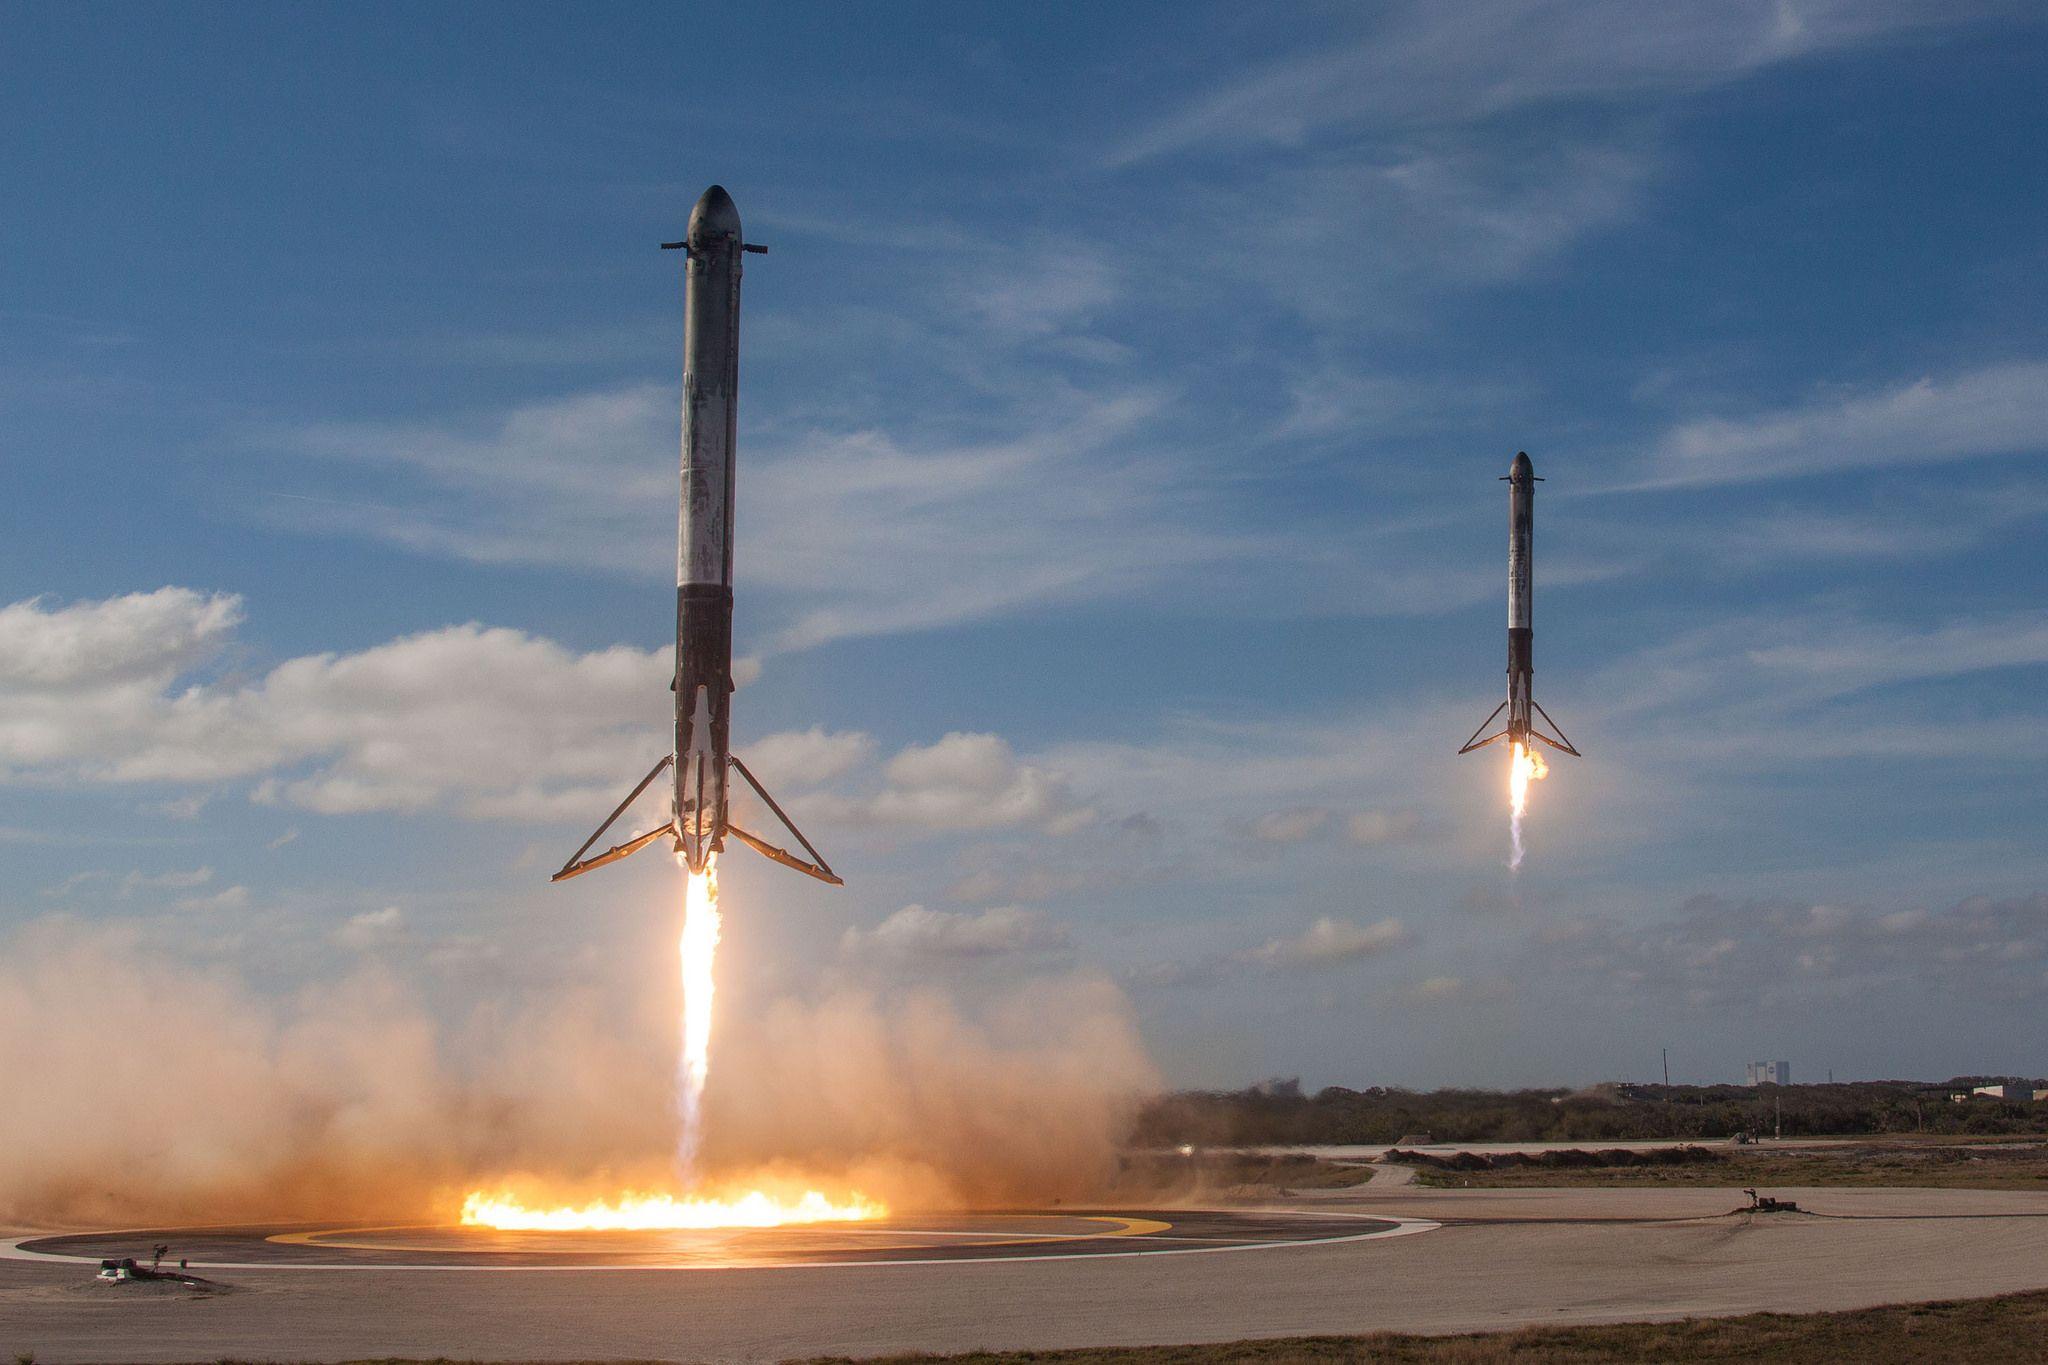 Elon Musk Reveals 'Giant Party Balloon' Plan to Return